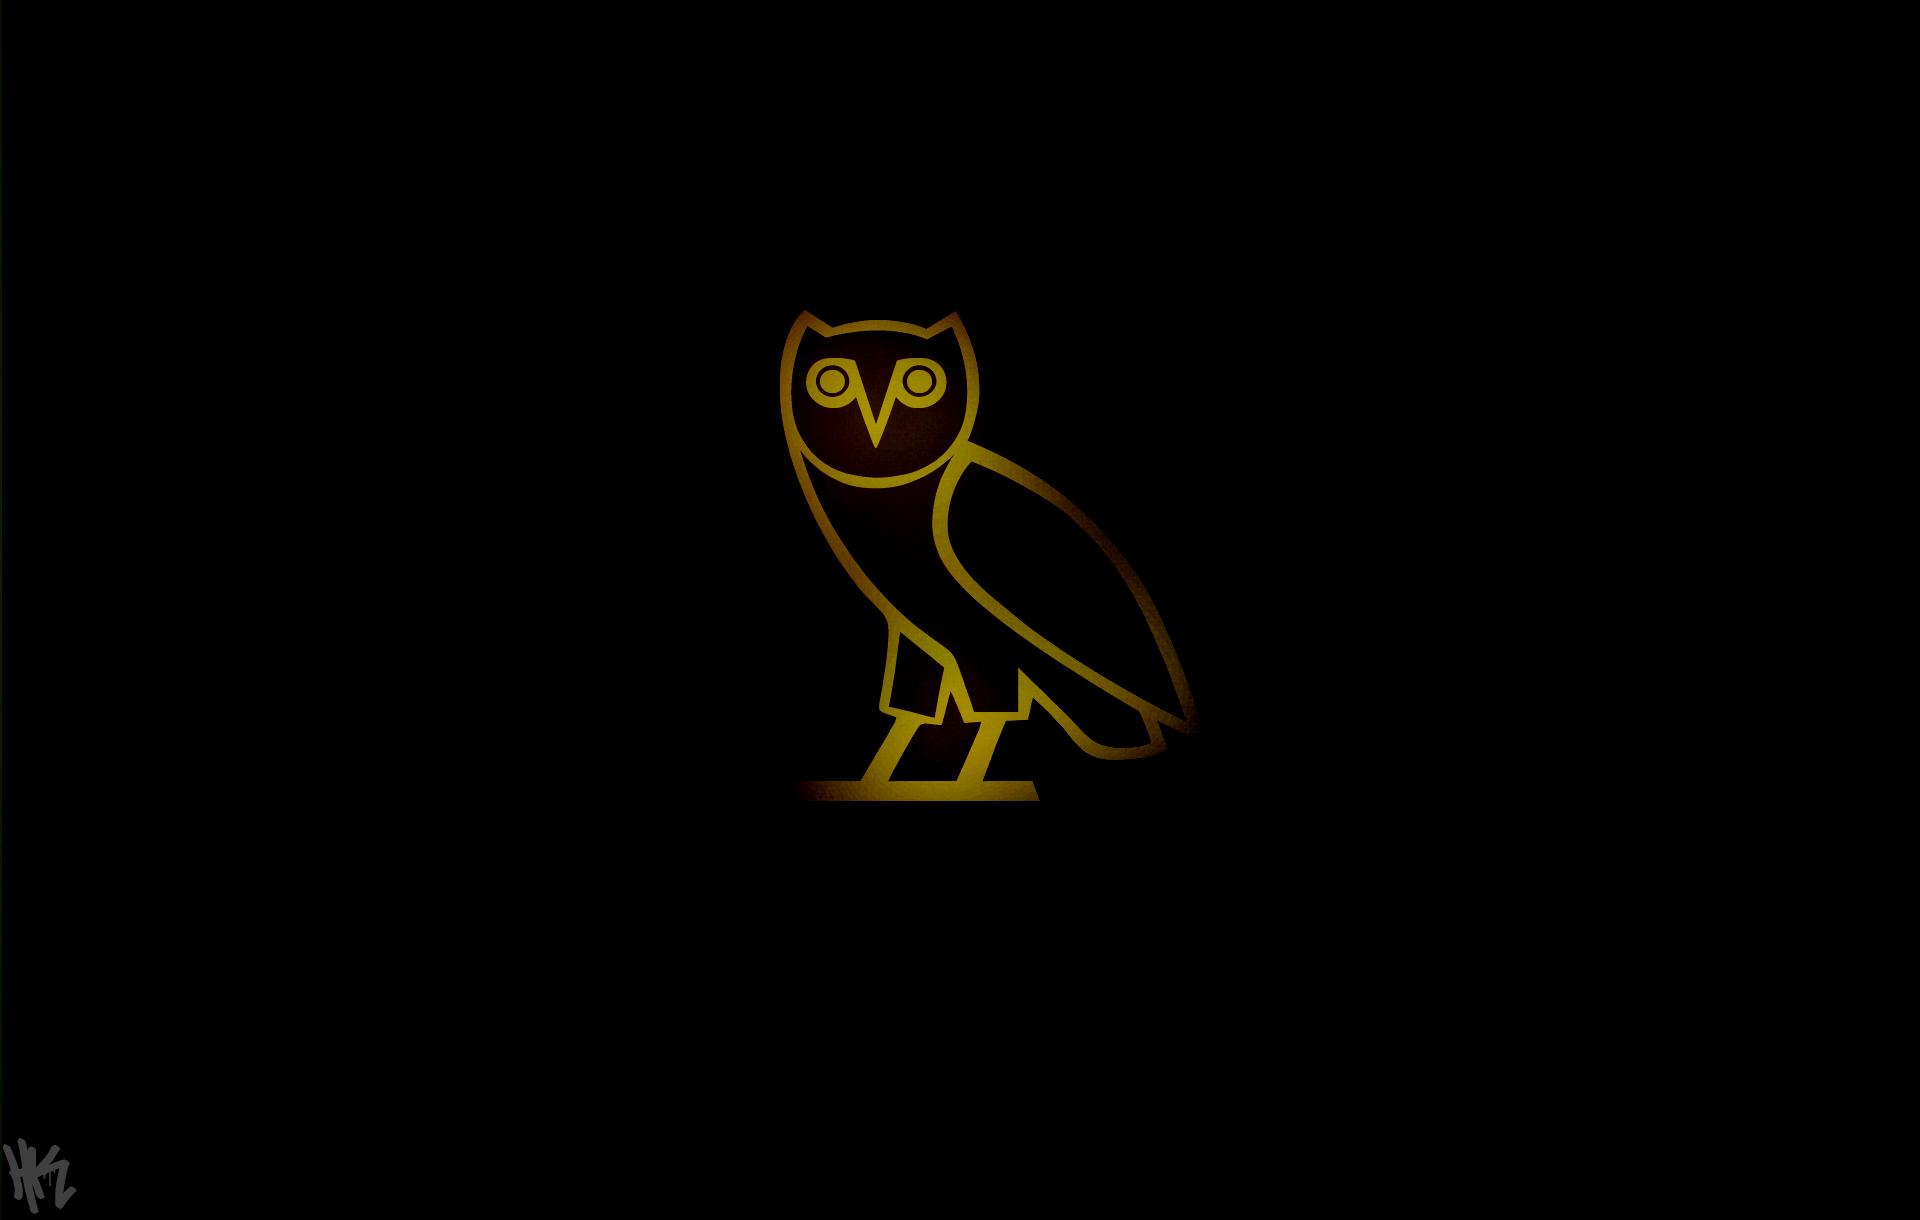 Drake Owl OVO IPhone Wallpaper